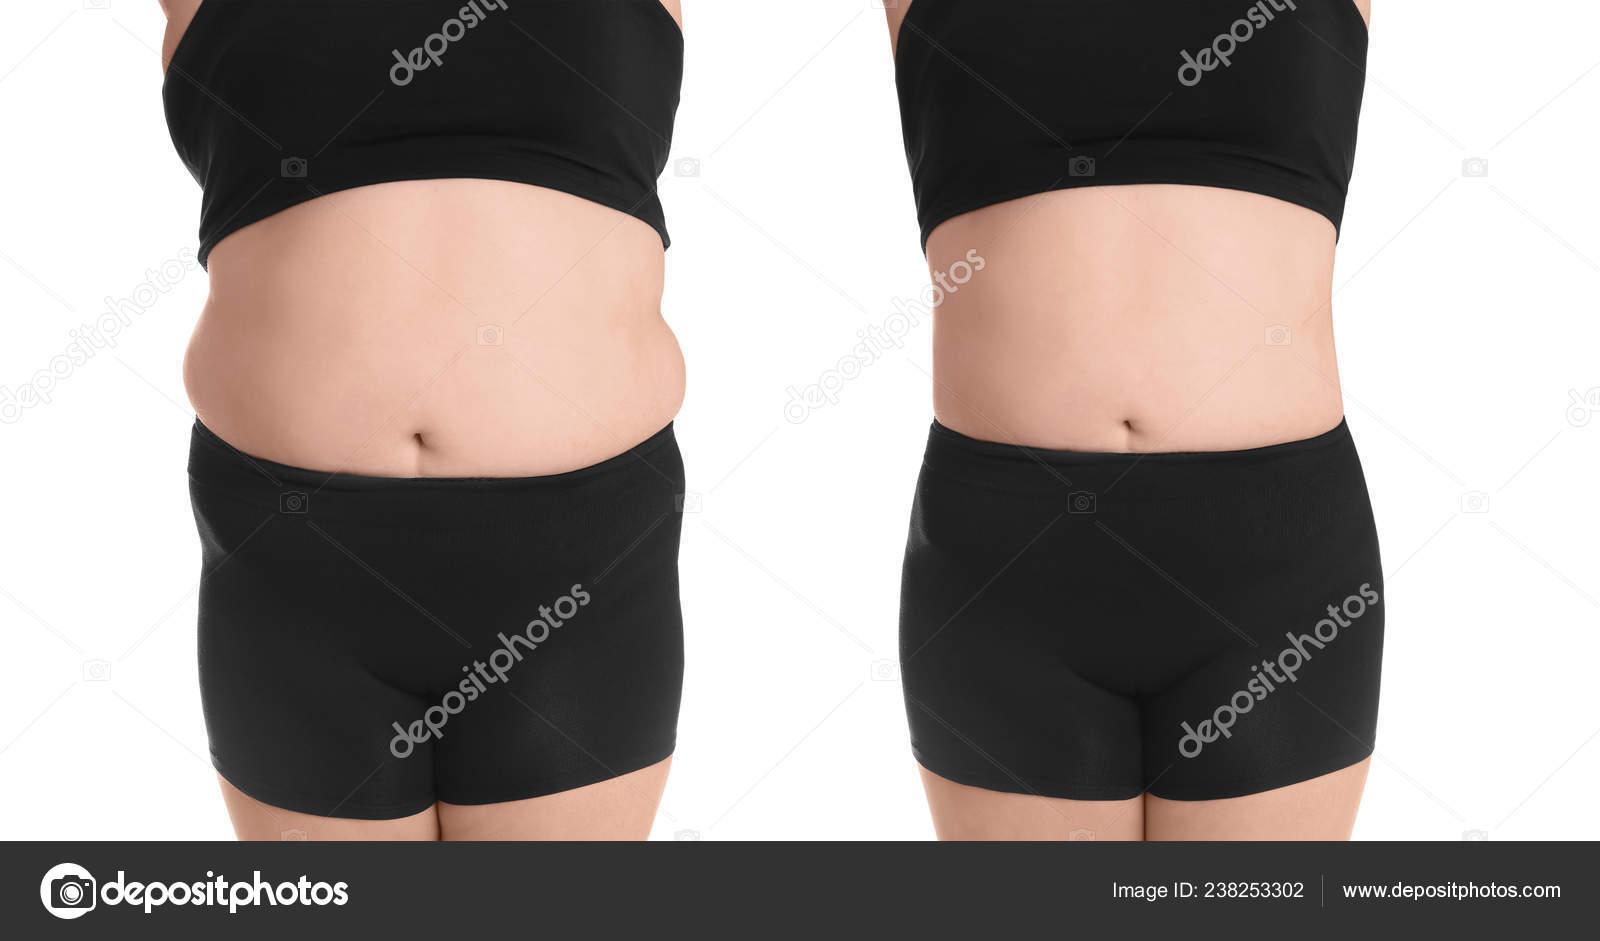 ecchymoses inexpliquées perte de poids fatigue perte de poids wyndhurst